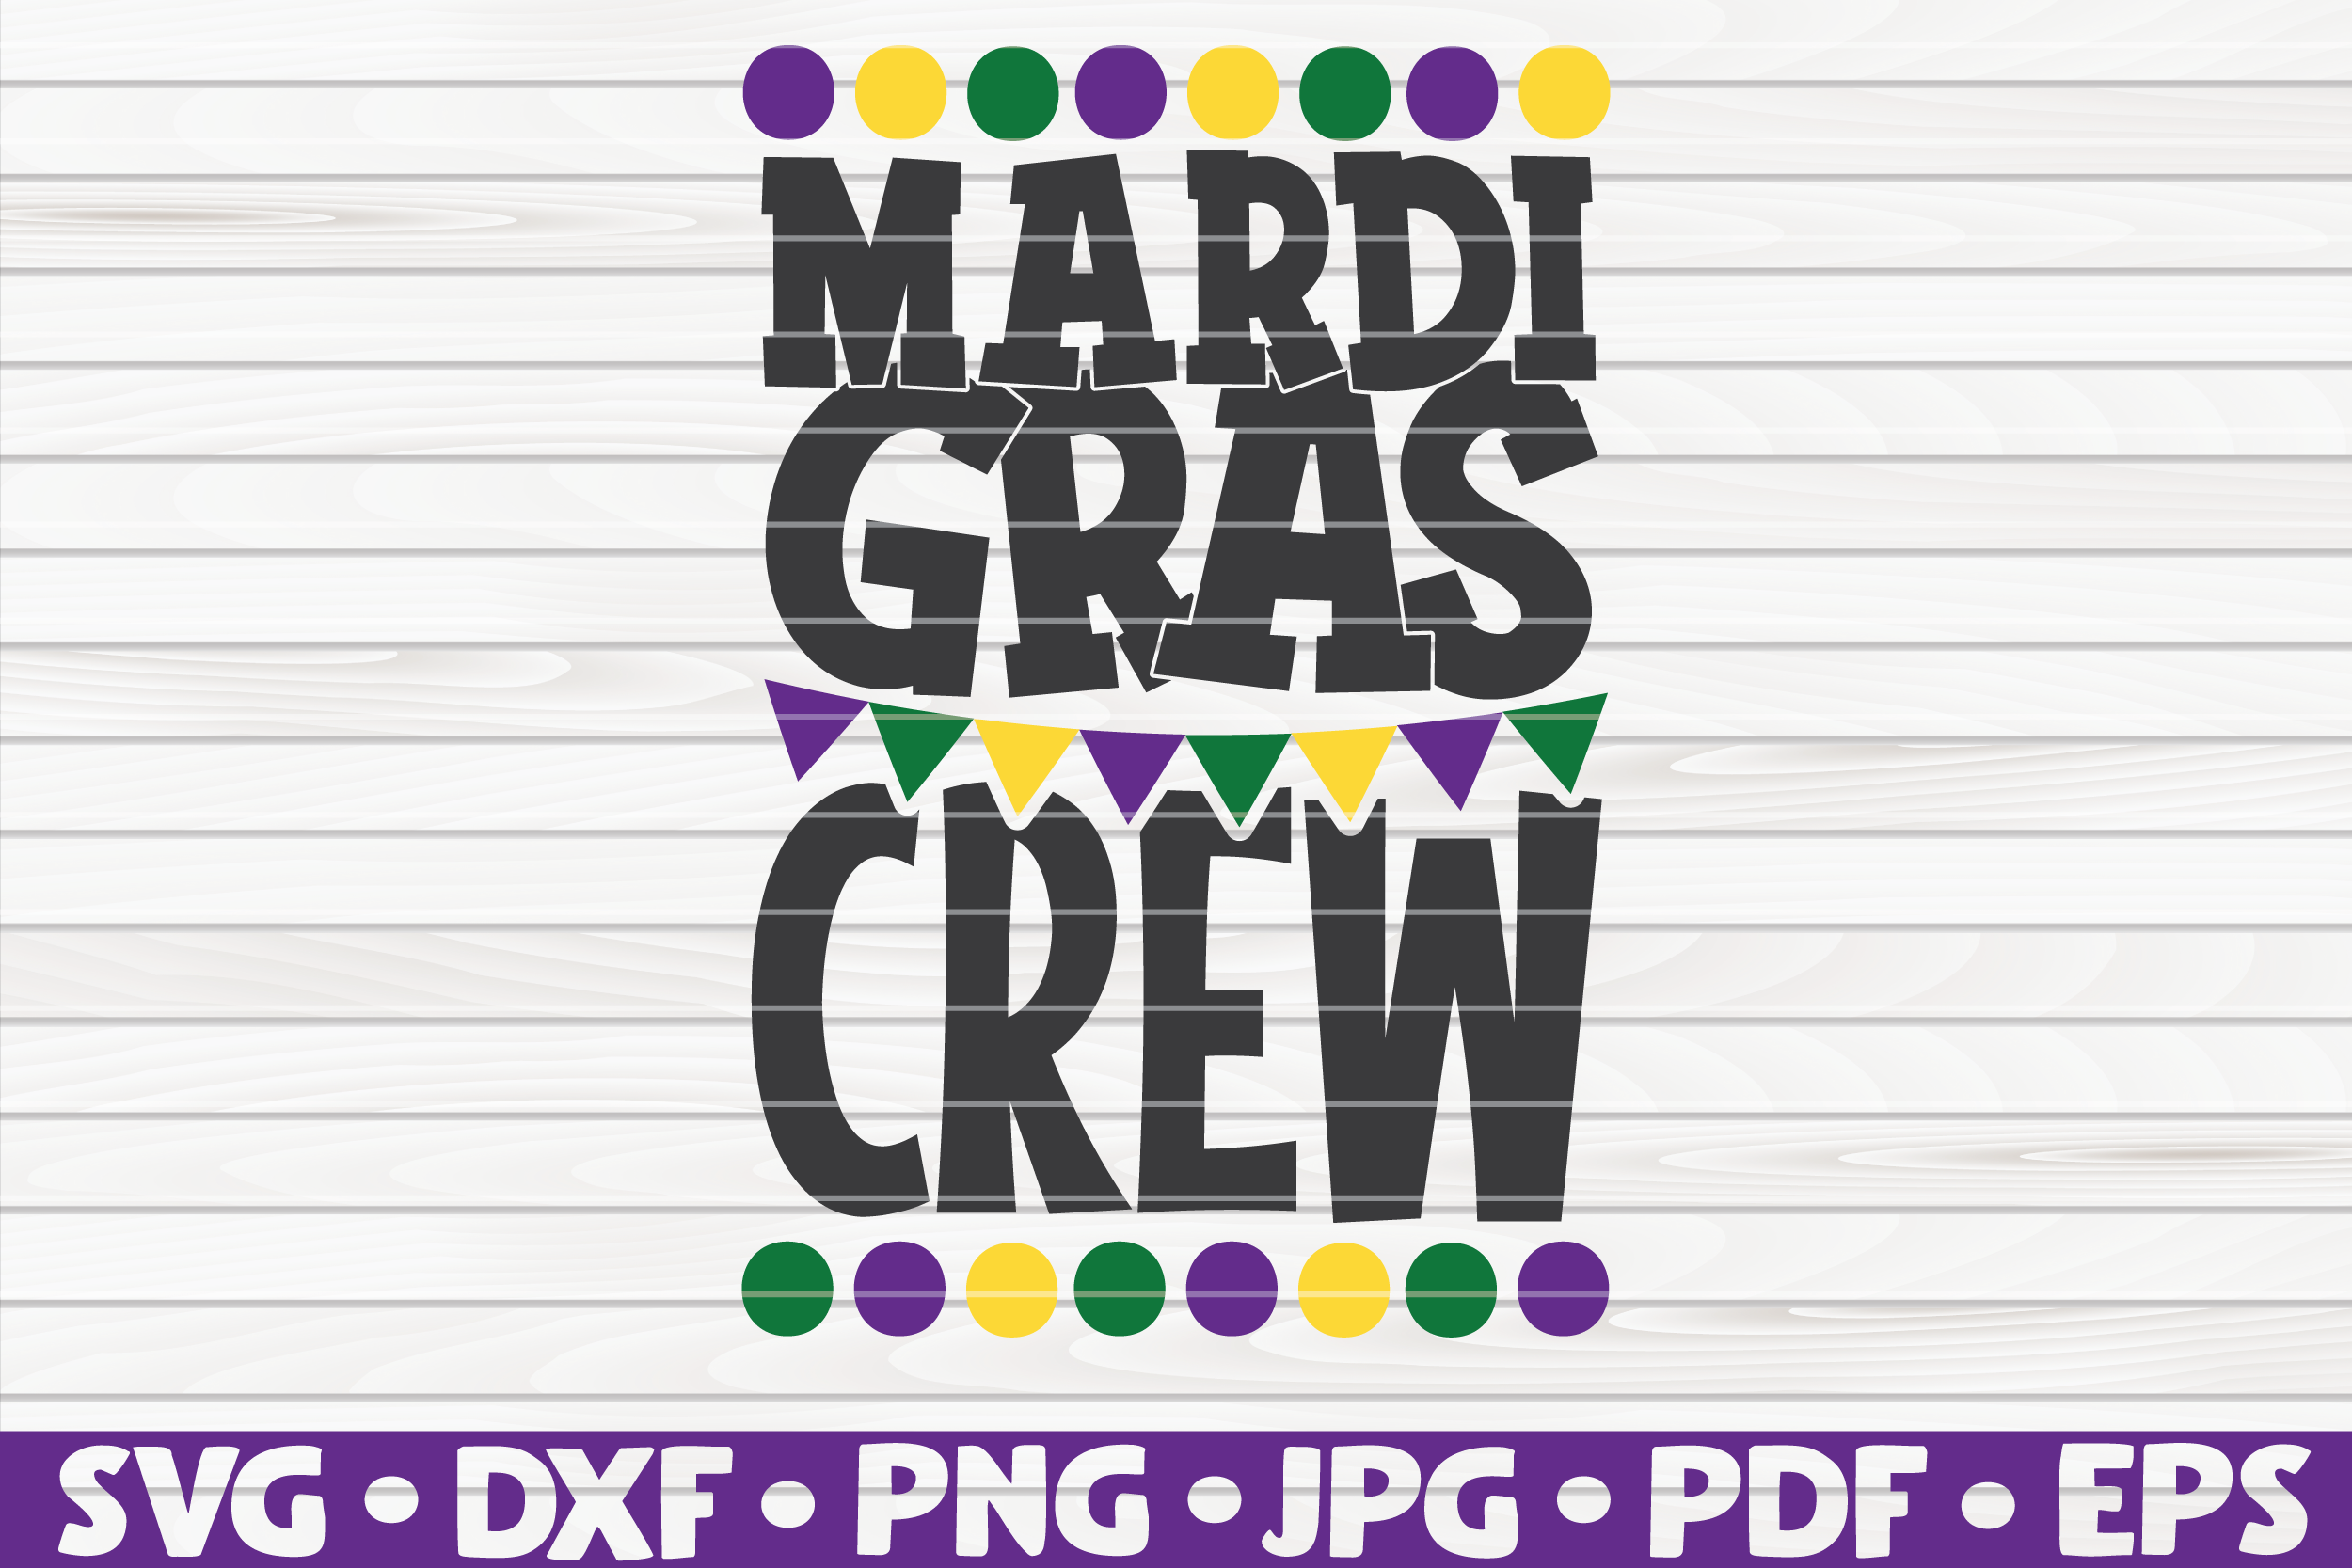 Mardi Gras Crew| Mardi Gras saying | SVG | cut file example image 1